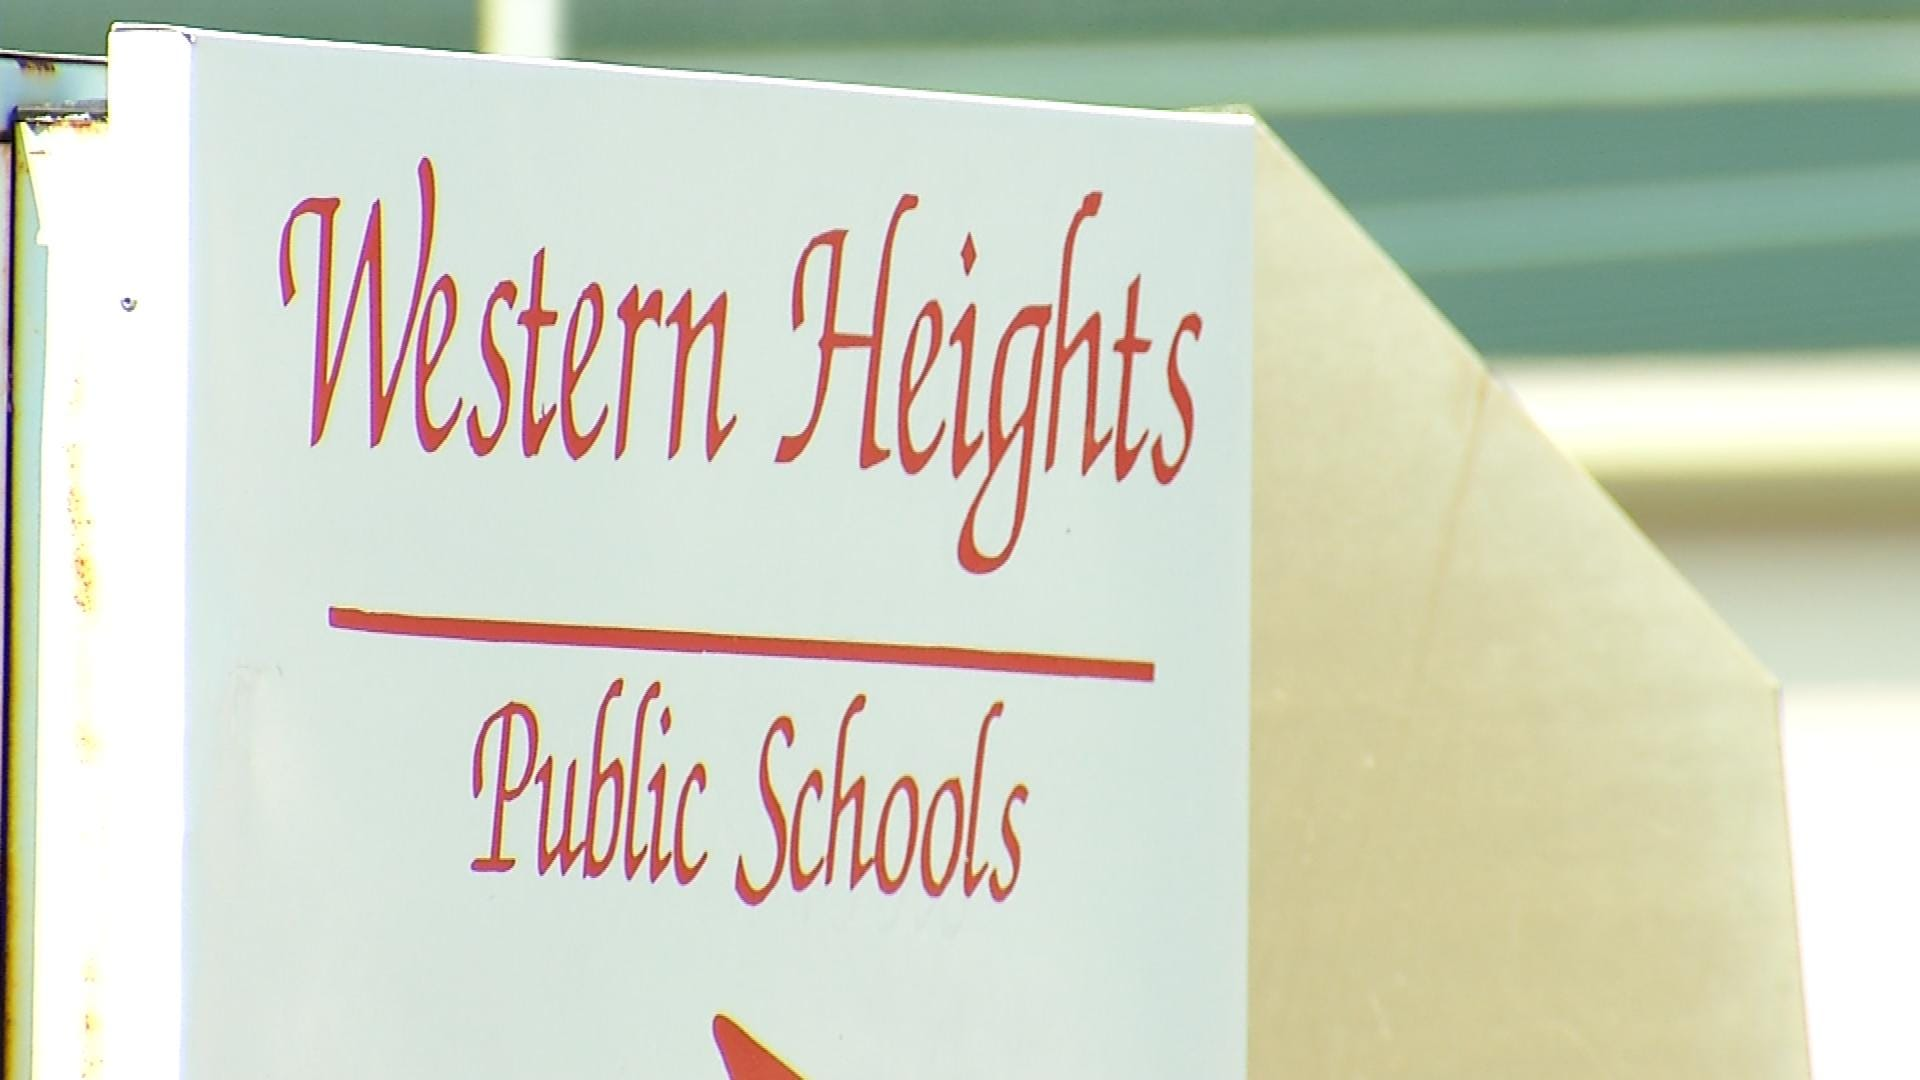 Metro Mom Files Federal Lawsuit Against Western Heights School District